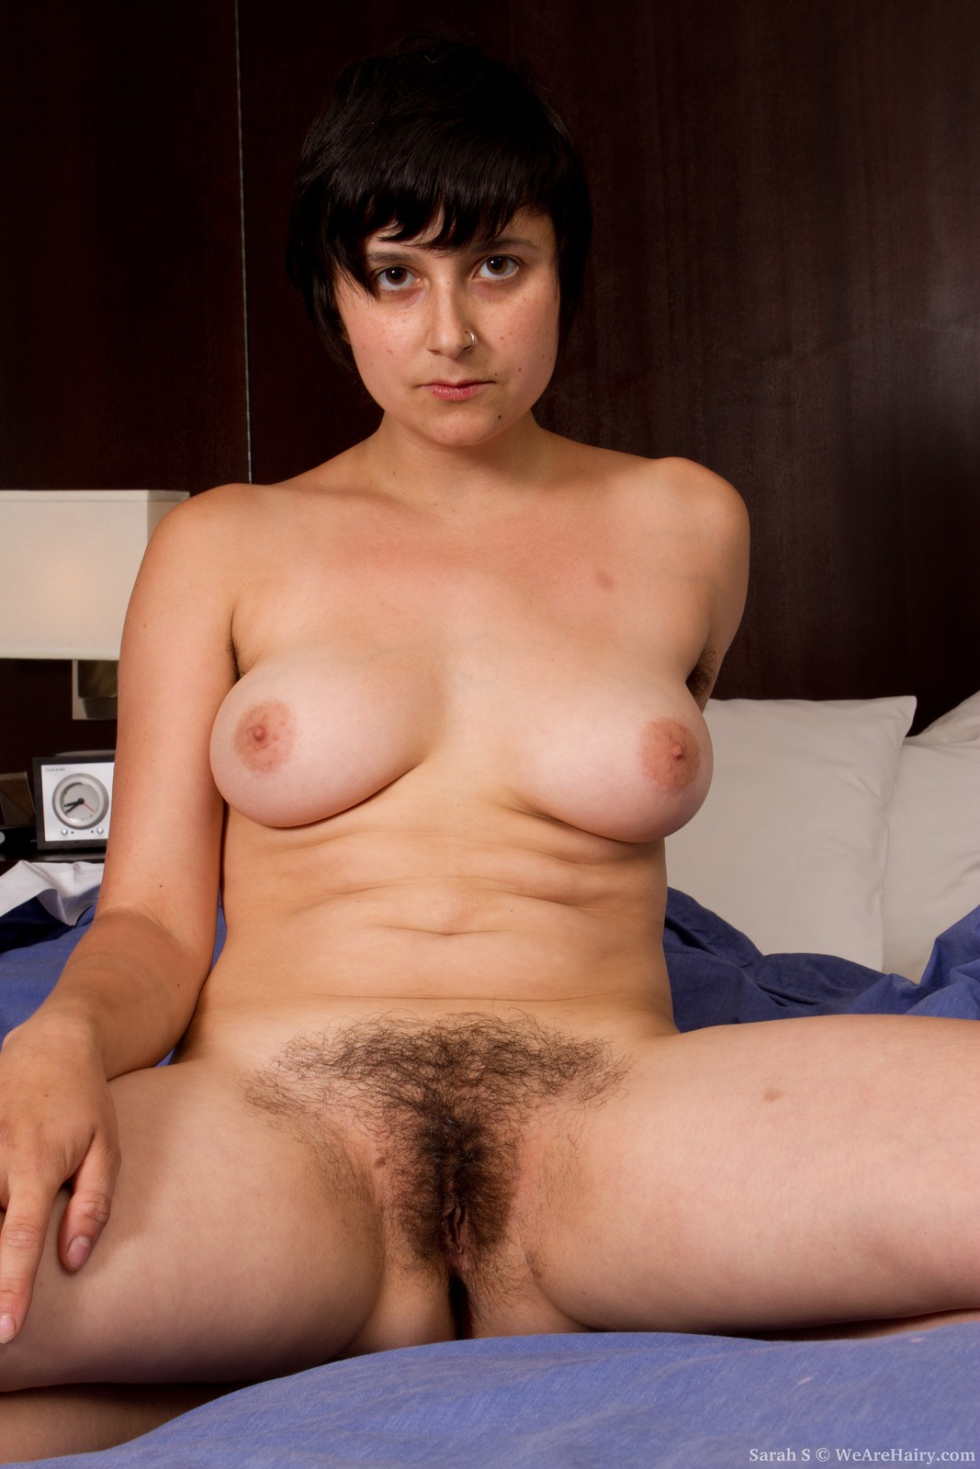 sarahs naked amateur pics